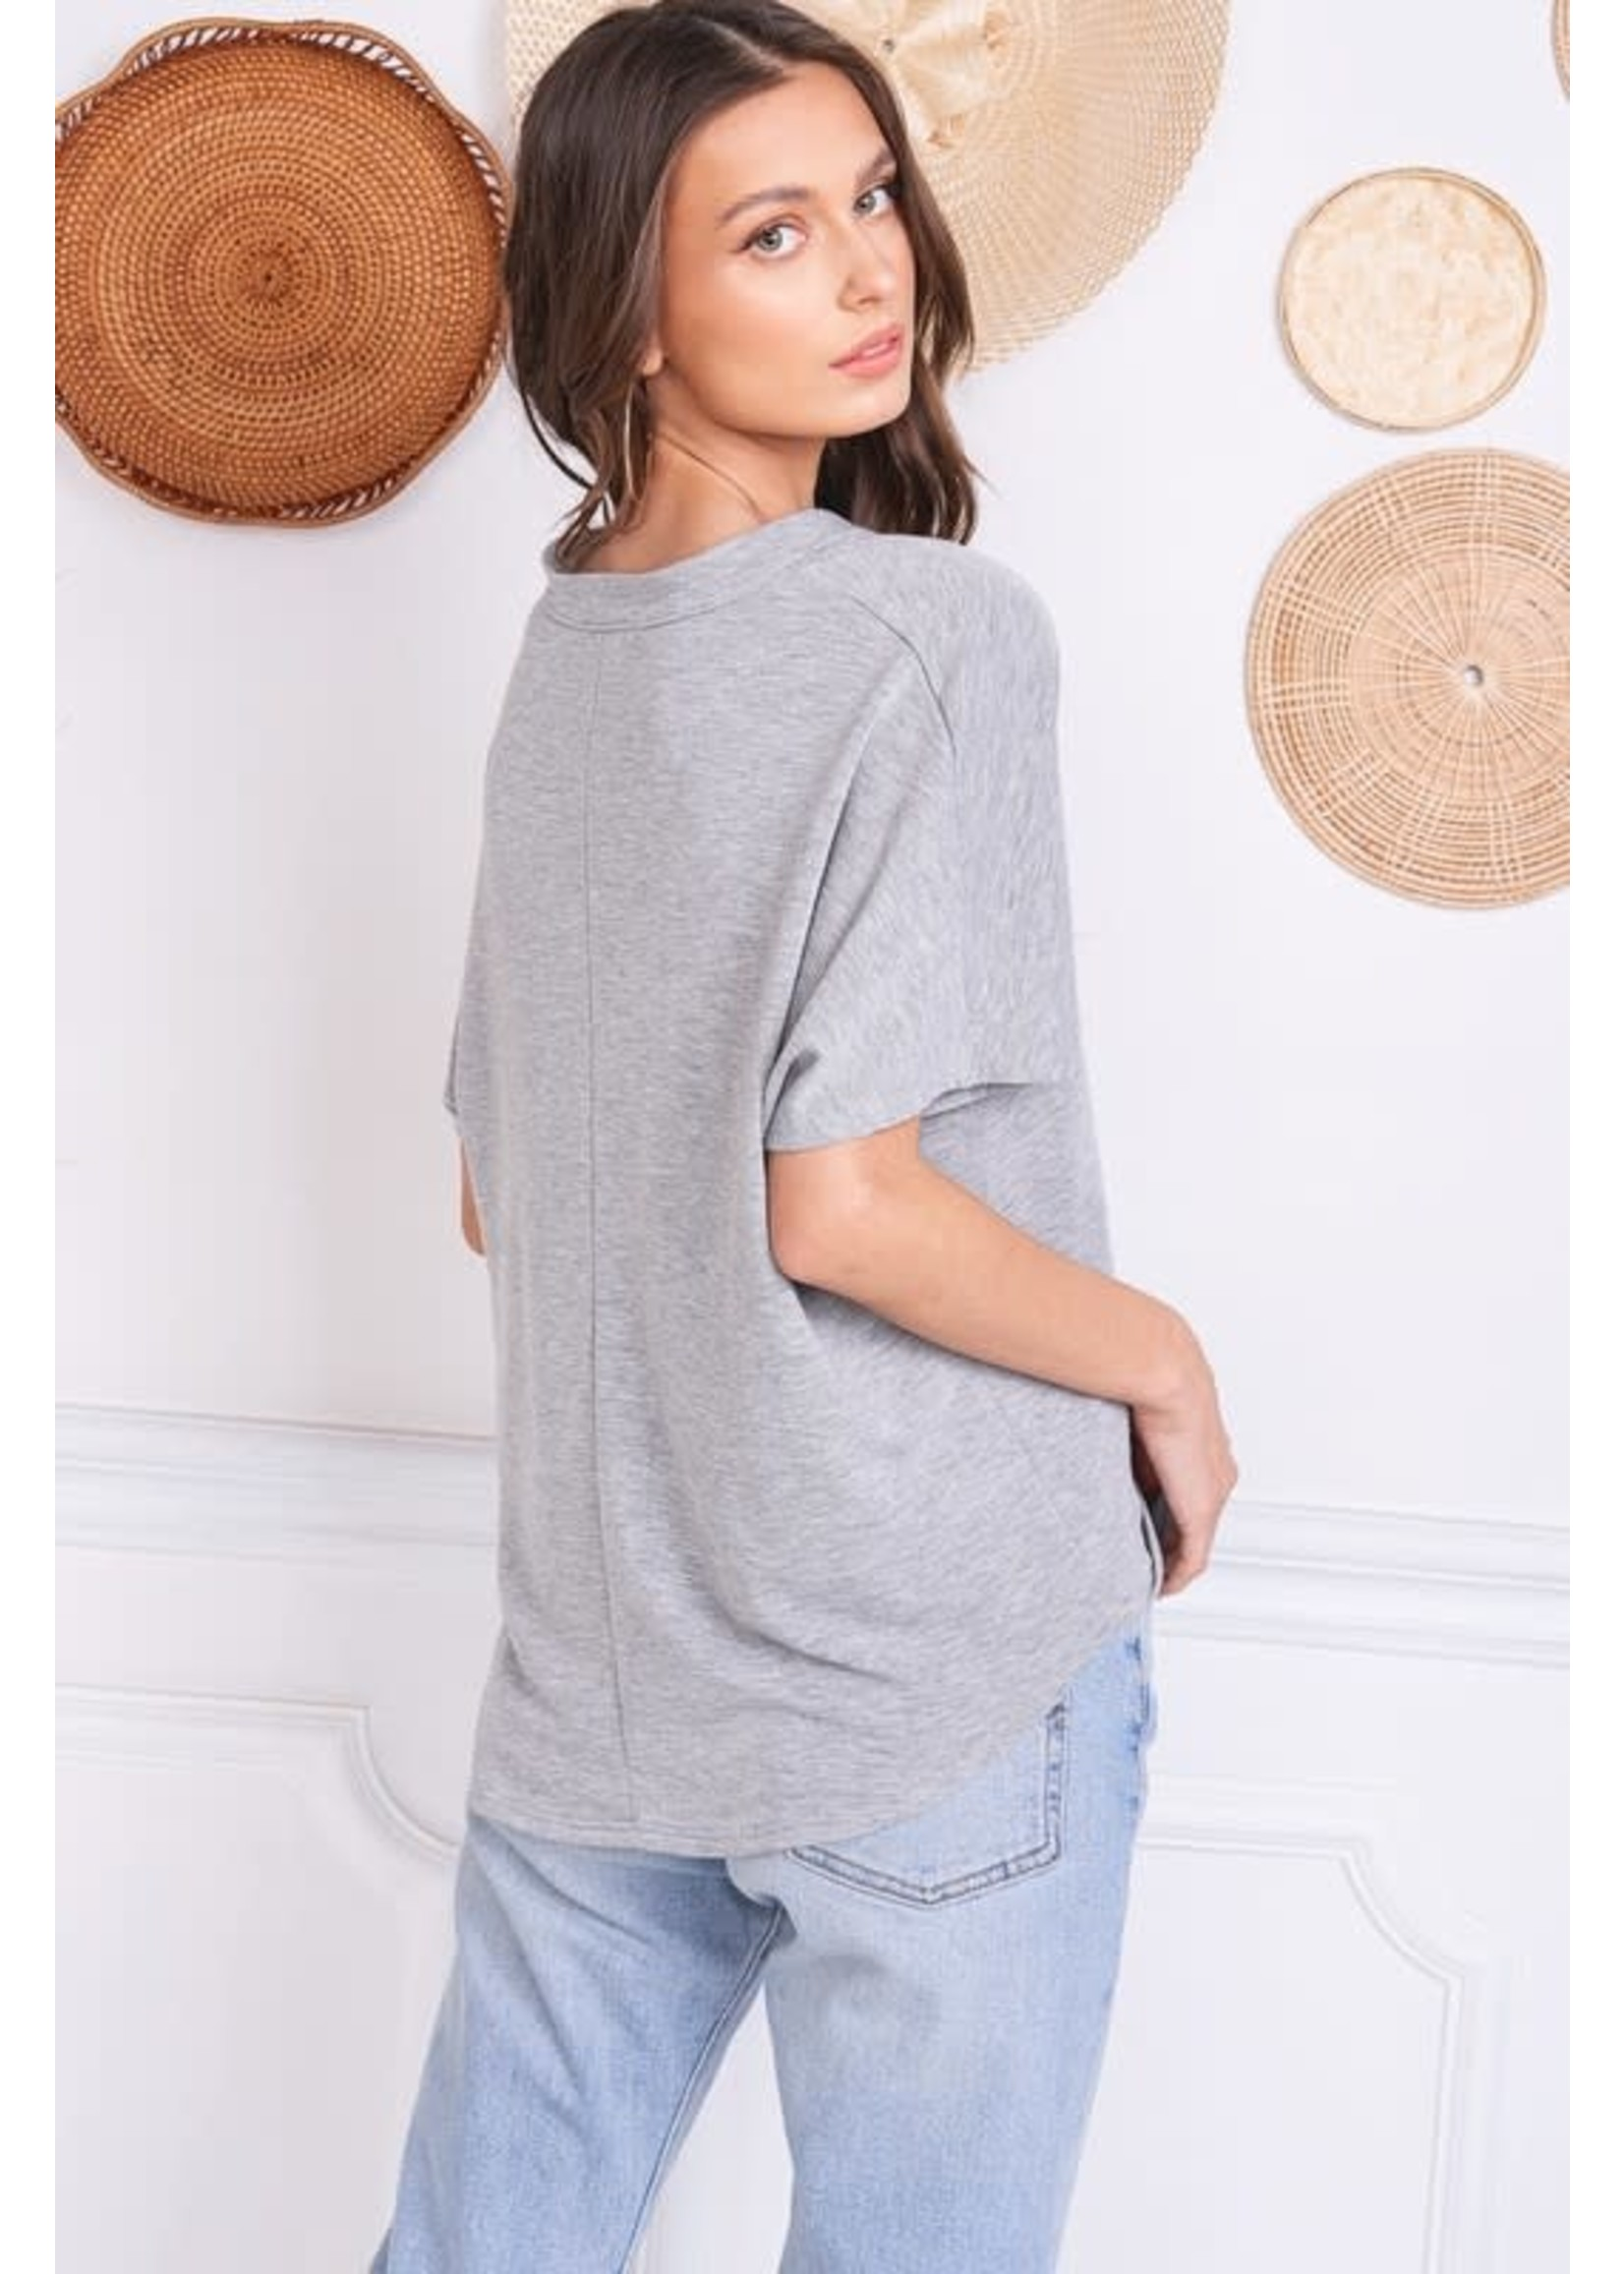 Charlotte Avery Loose Placket T-Shirt - 11436